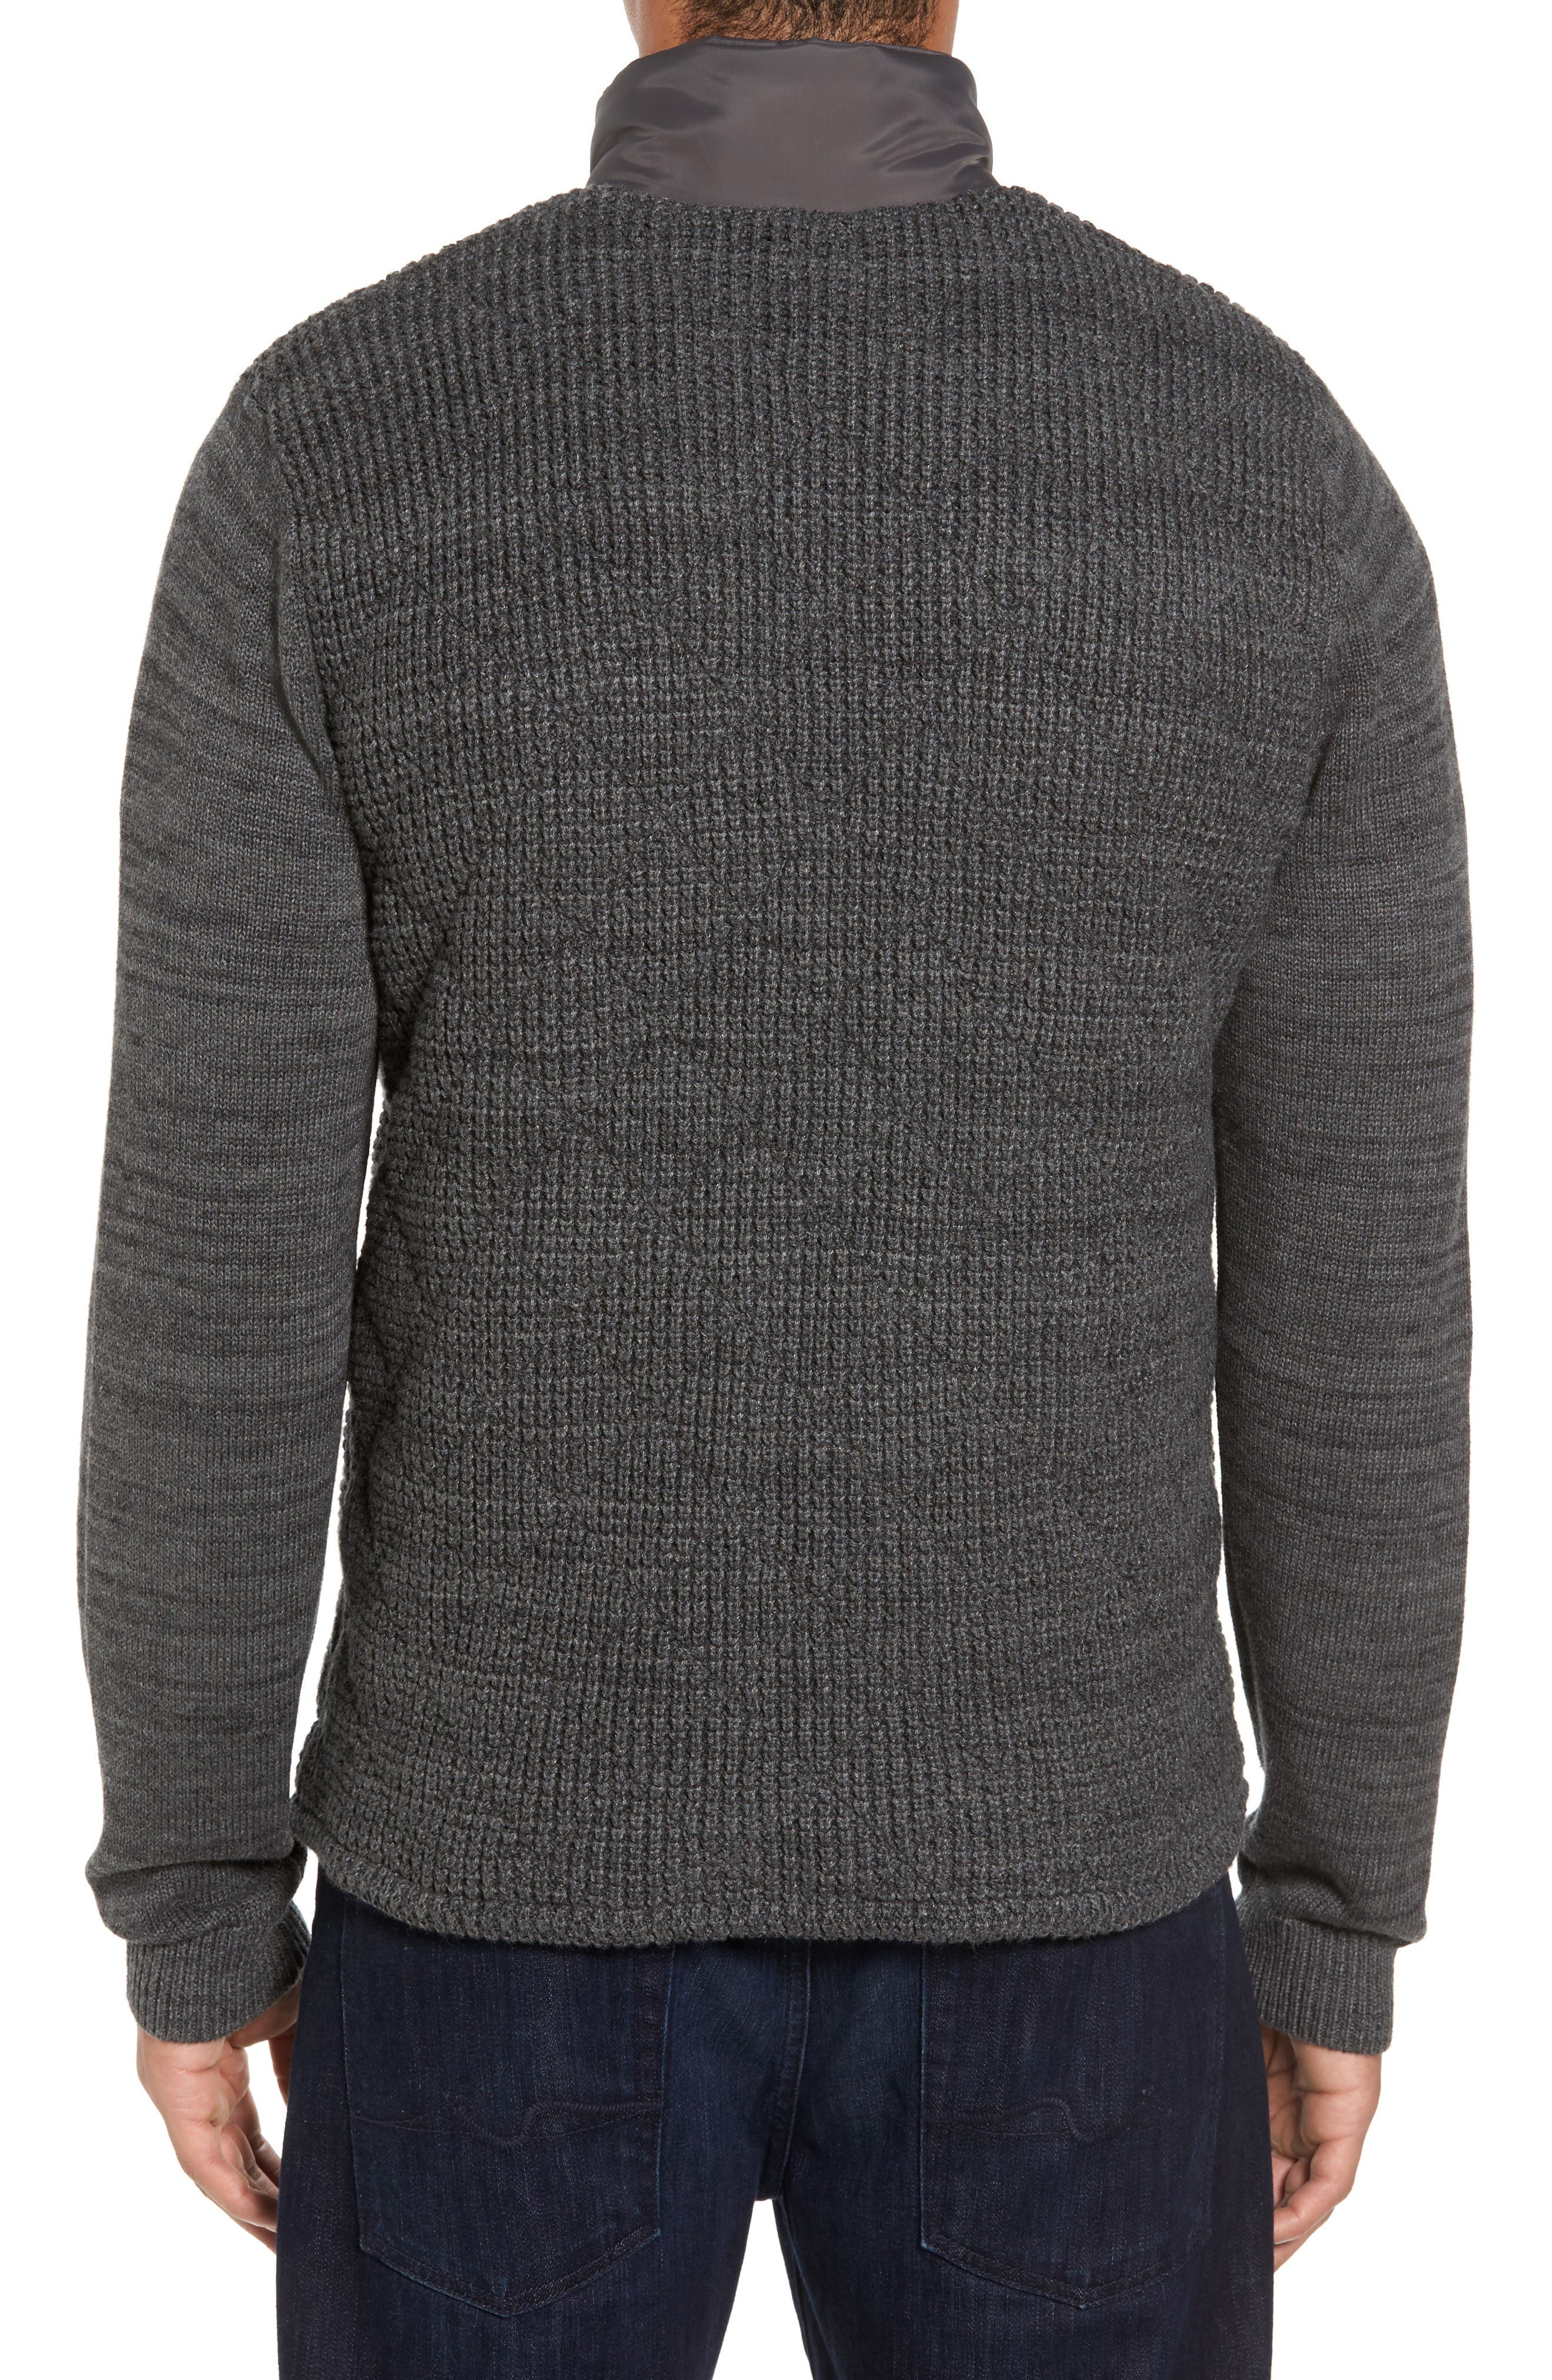 Mixed Media Full Zip Sweater,                             Alternate thumbnail 2, color,                             Grey Dark Charcoal Spacedye